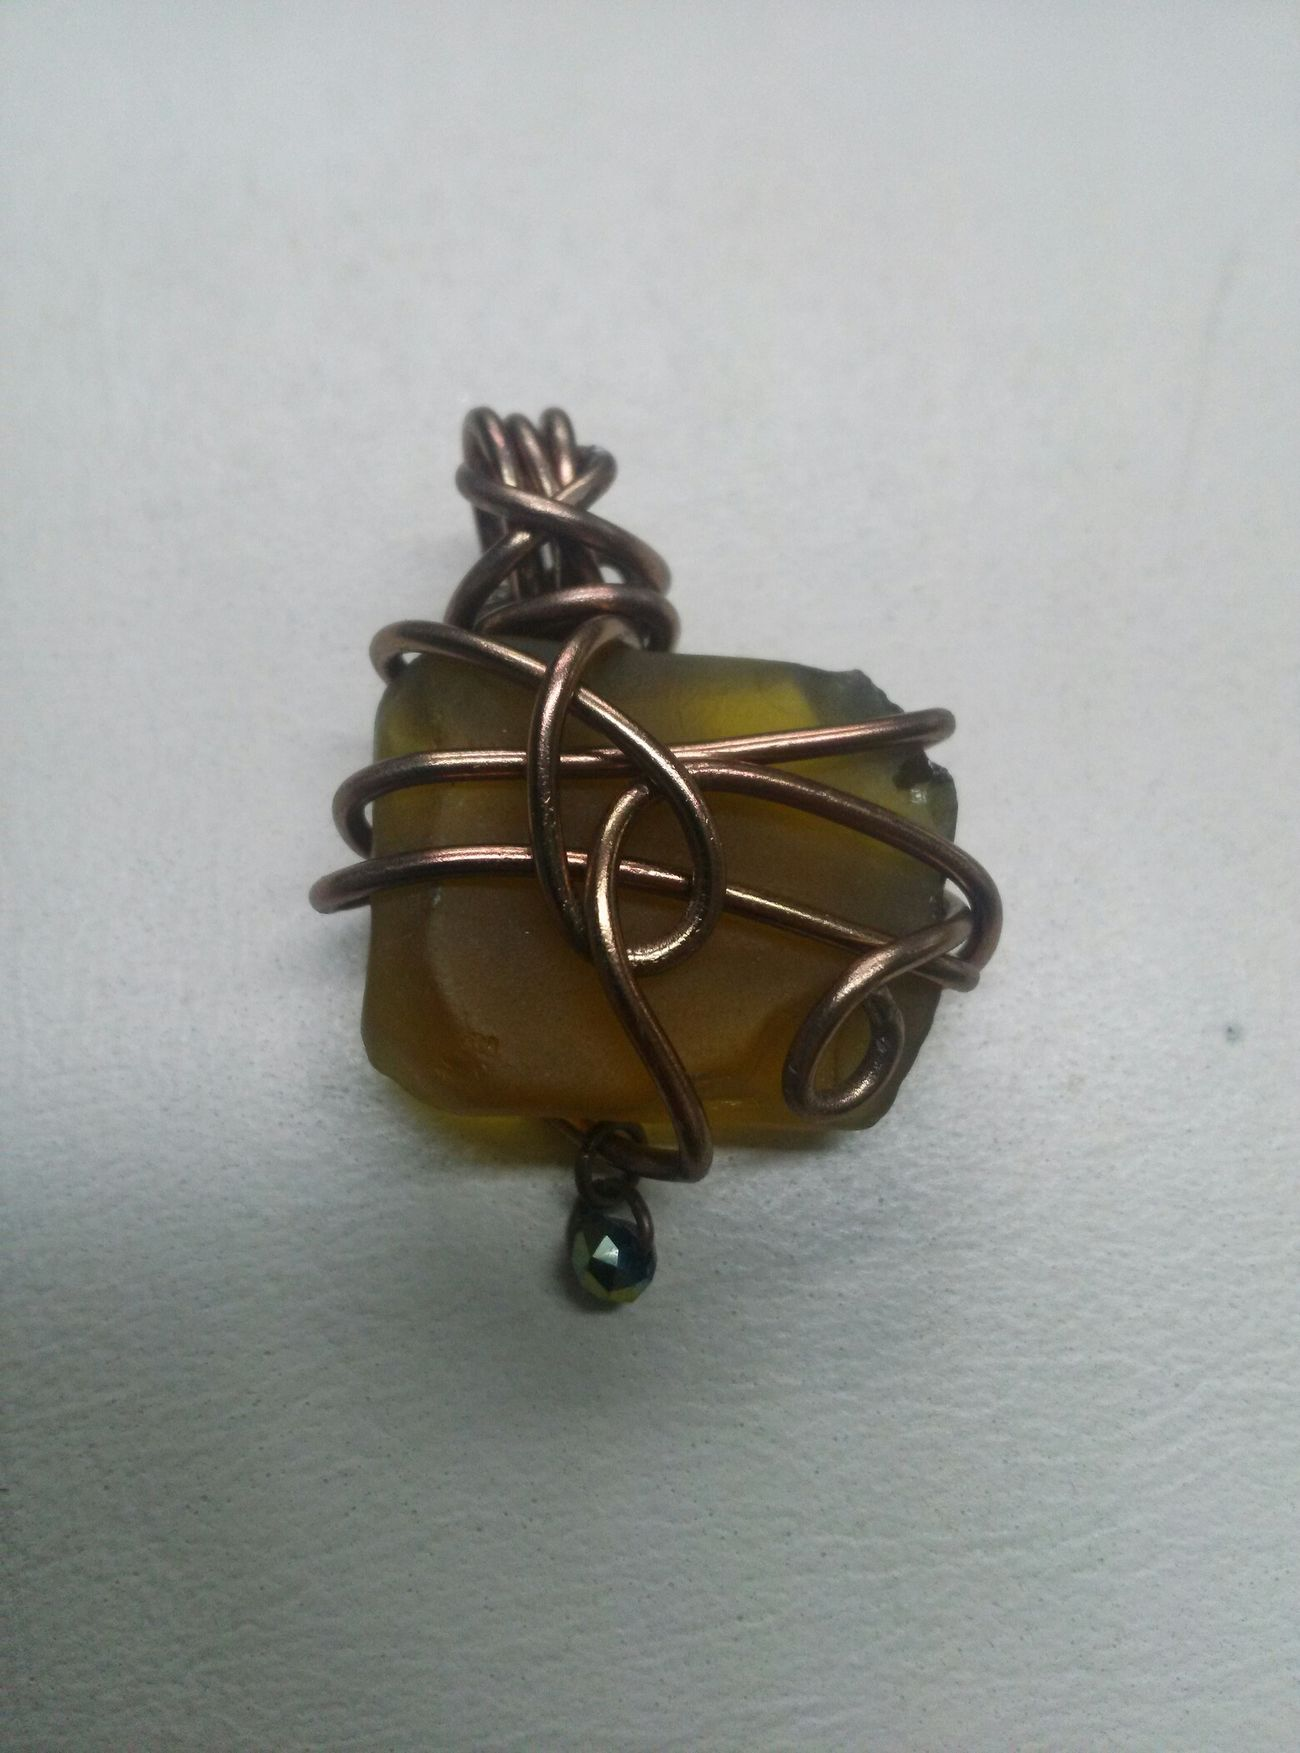 Handmade Handmadejewelry Handmade Gifts Handmade By Me My Handmade Work Handmade Jewelry